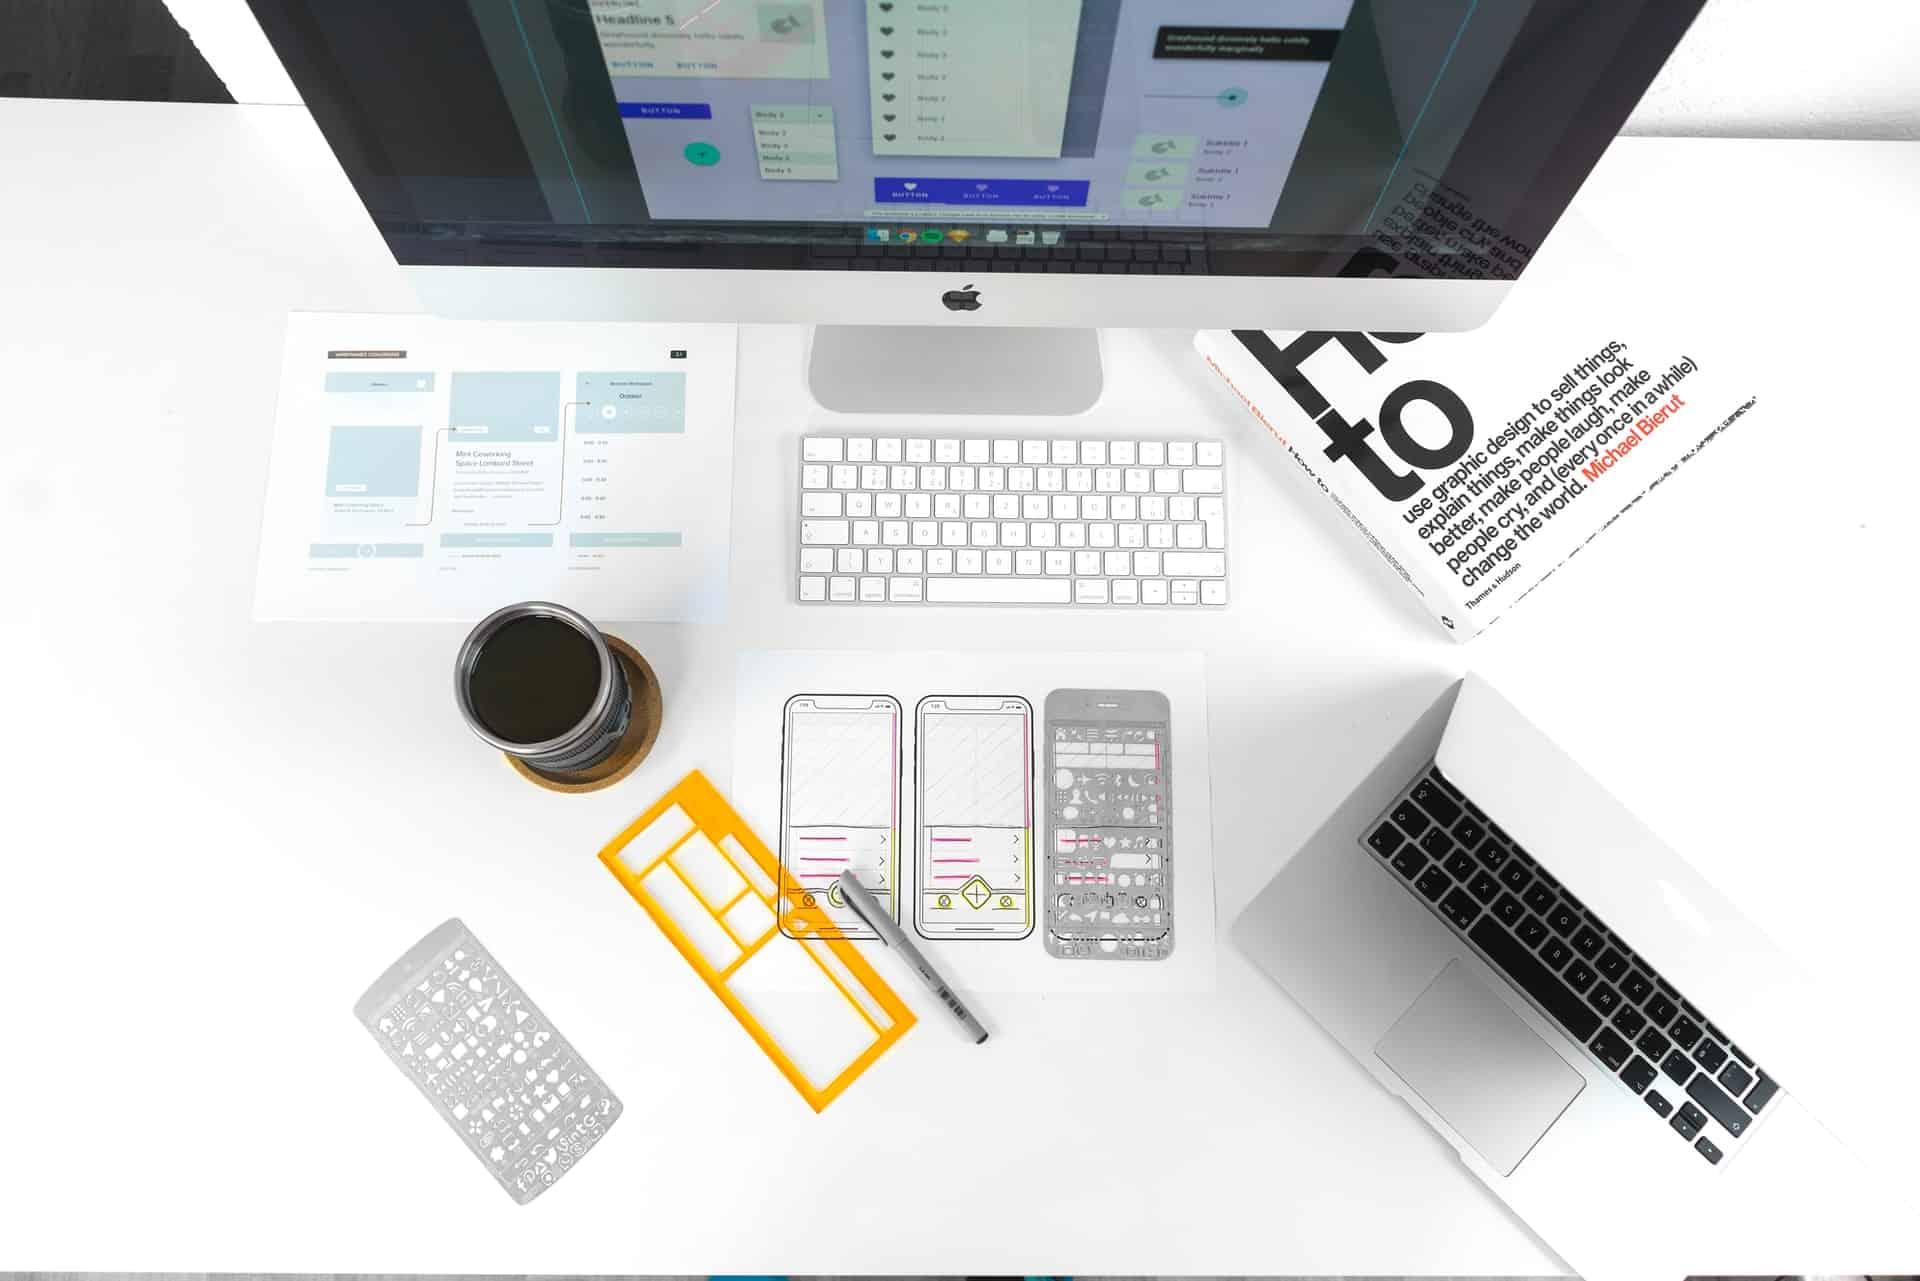 UX design tools on computer desk